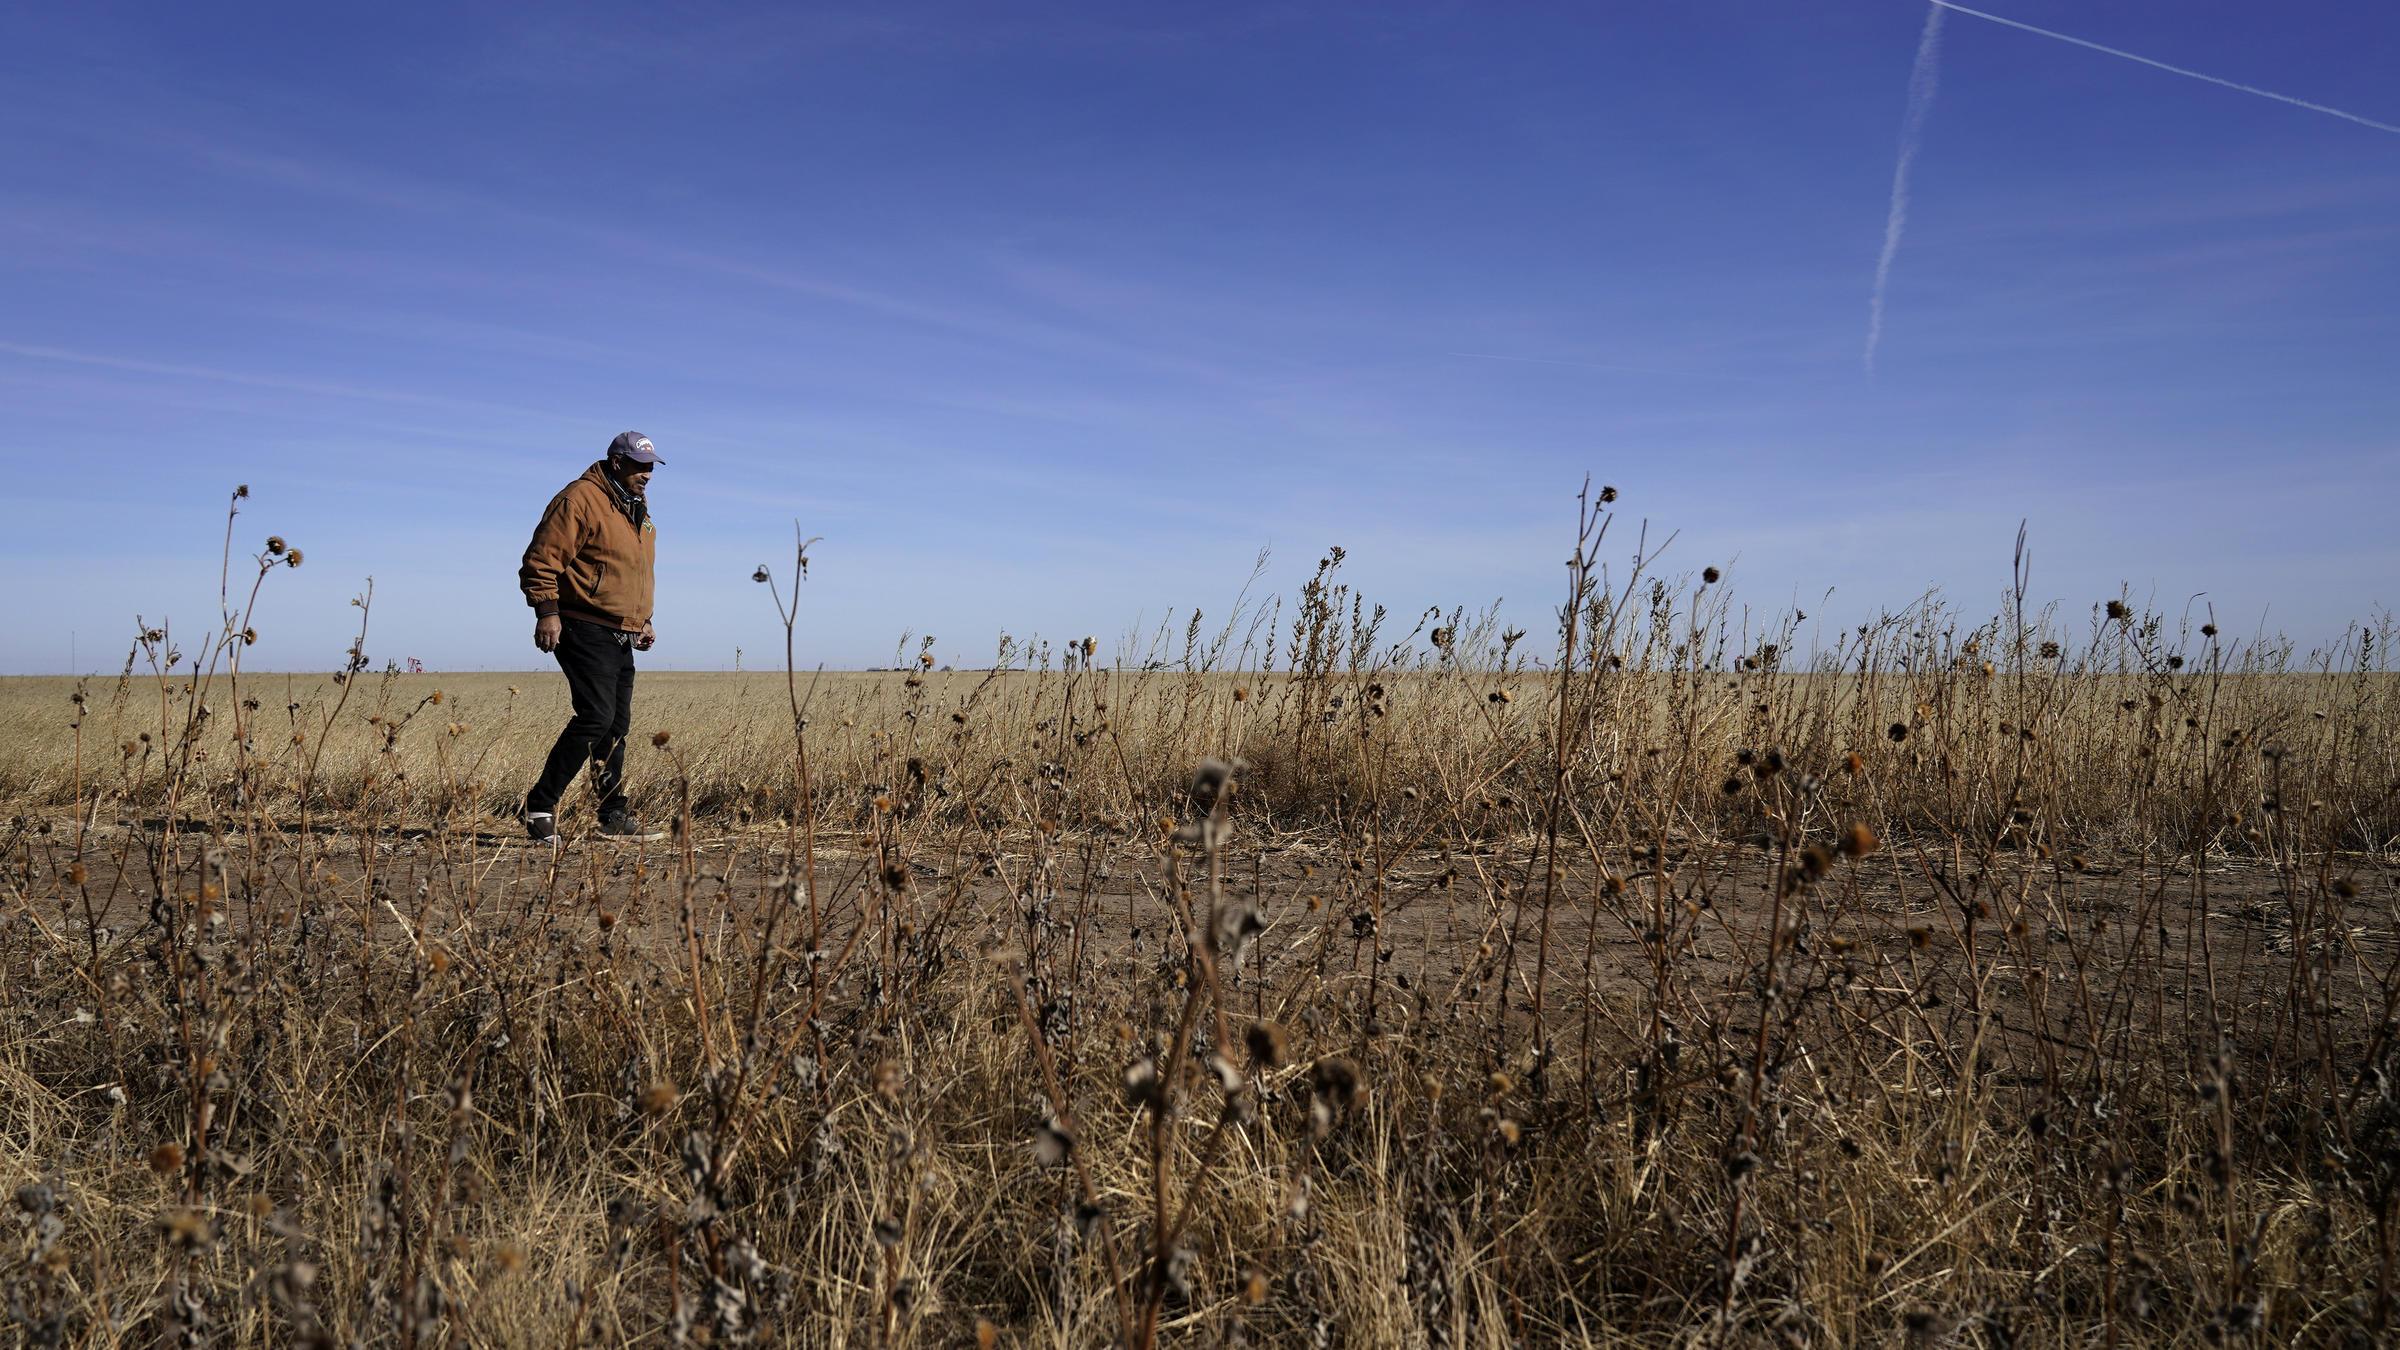 Biden Thinks Debt Relief Will Save Black Farmers From Extinction 6/5/21